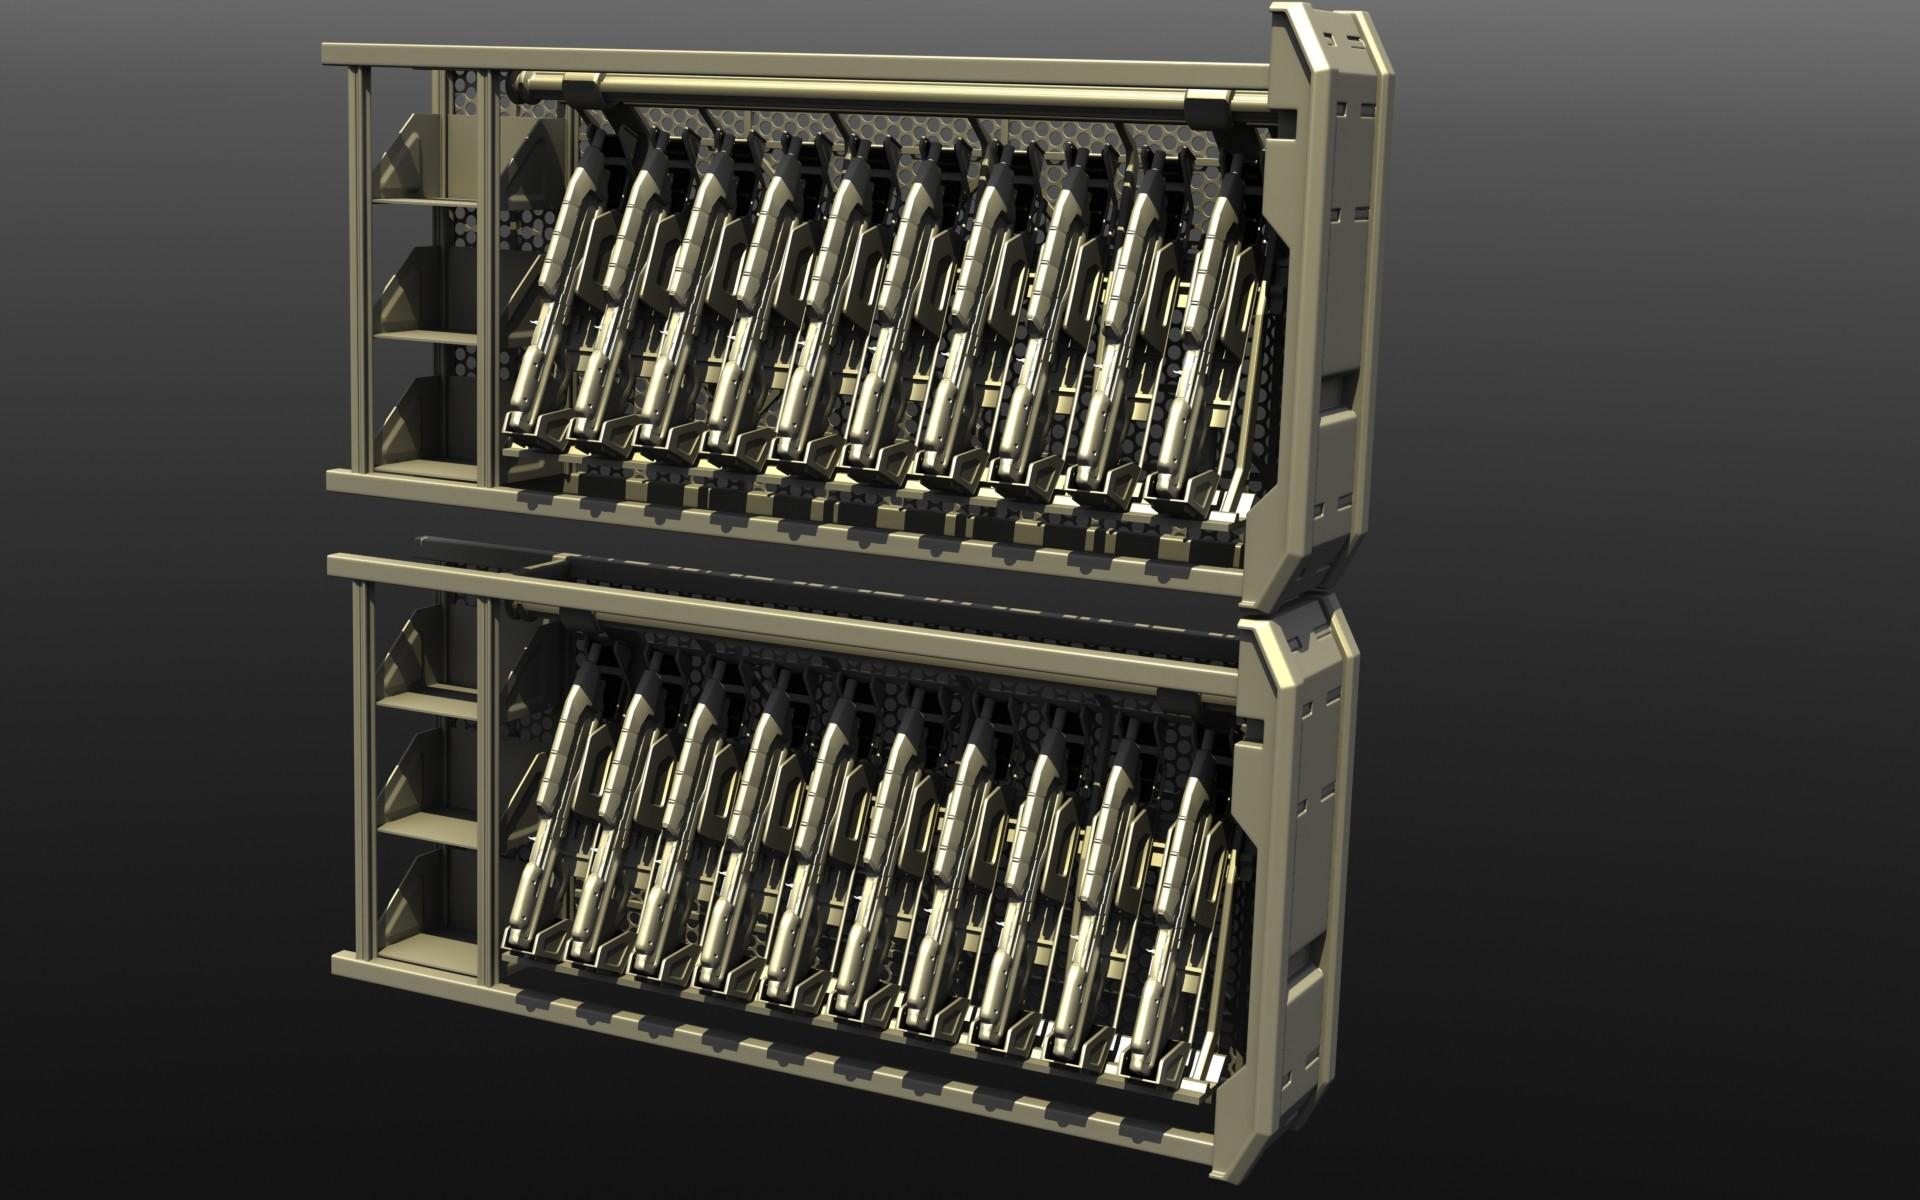 Roo macneill weapon rack3